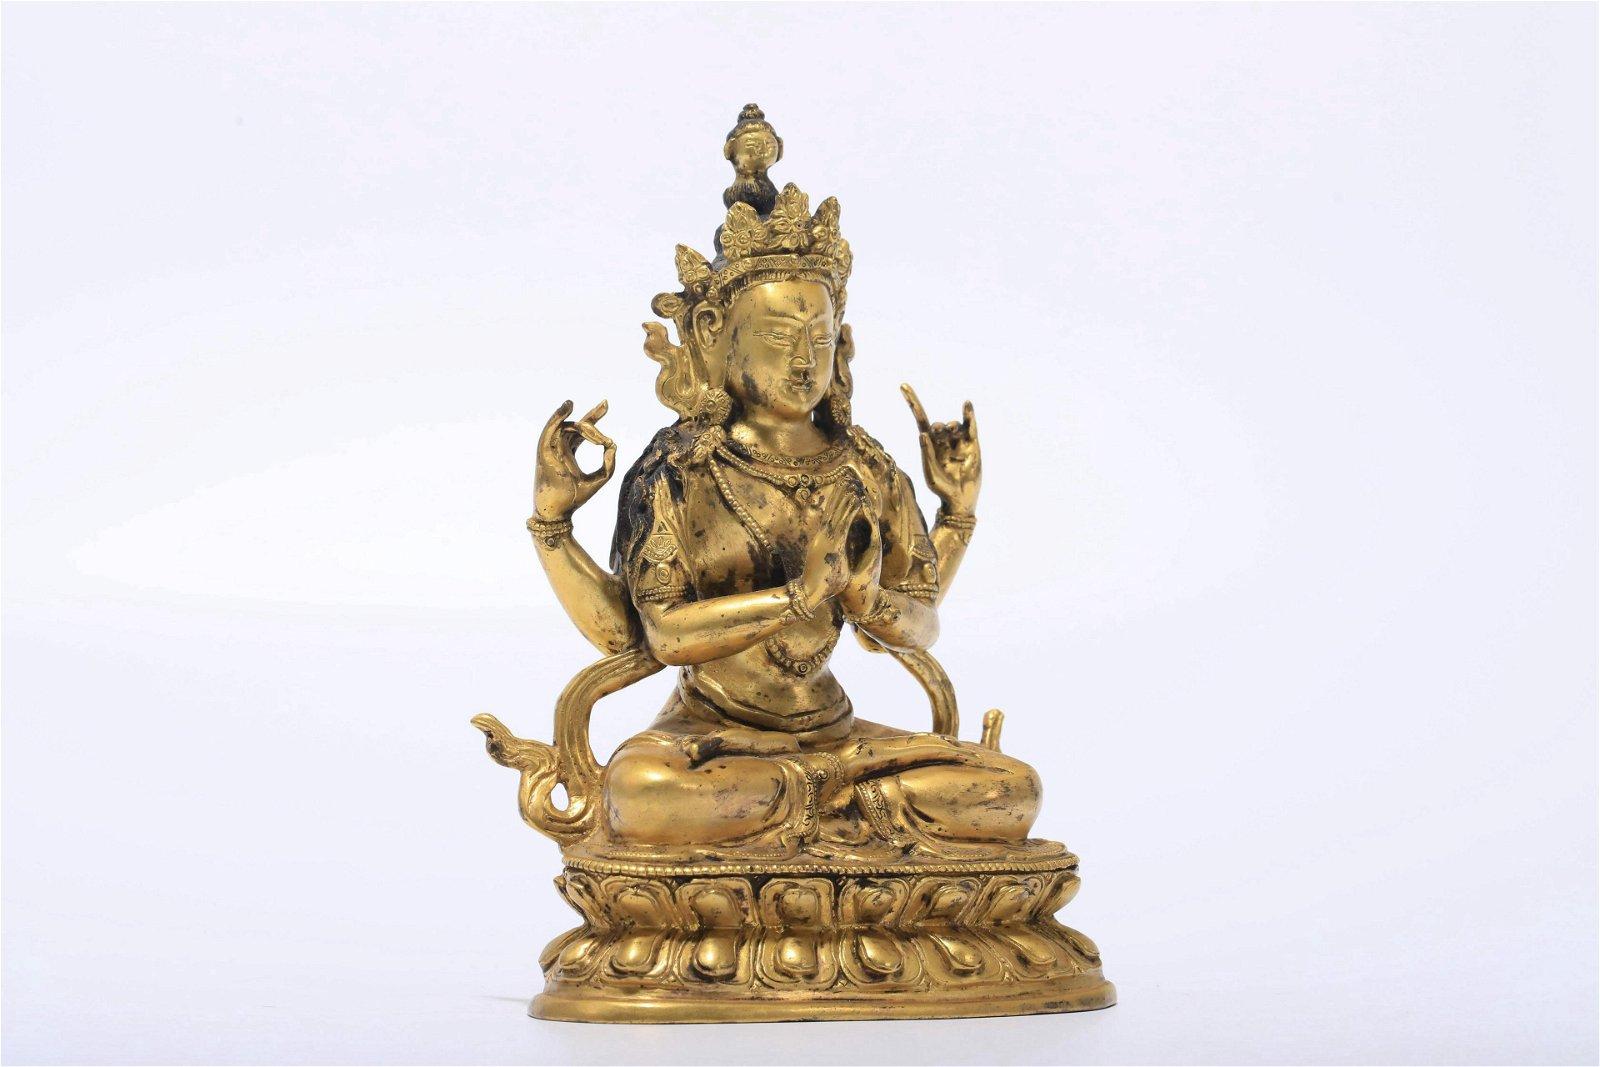 A Gilded Bronze Buddha Statue